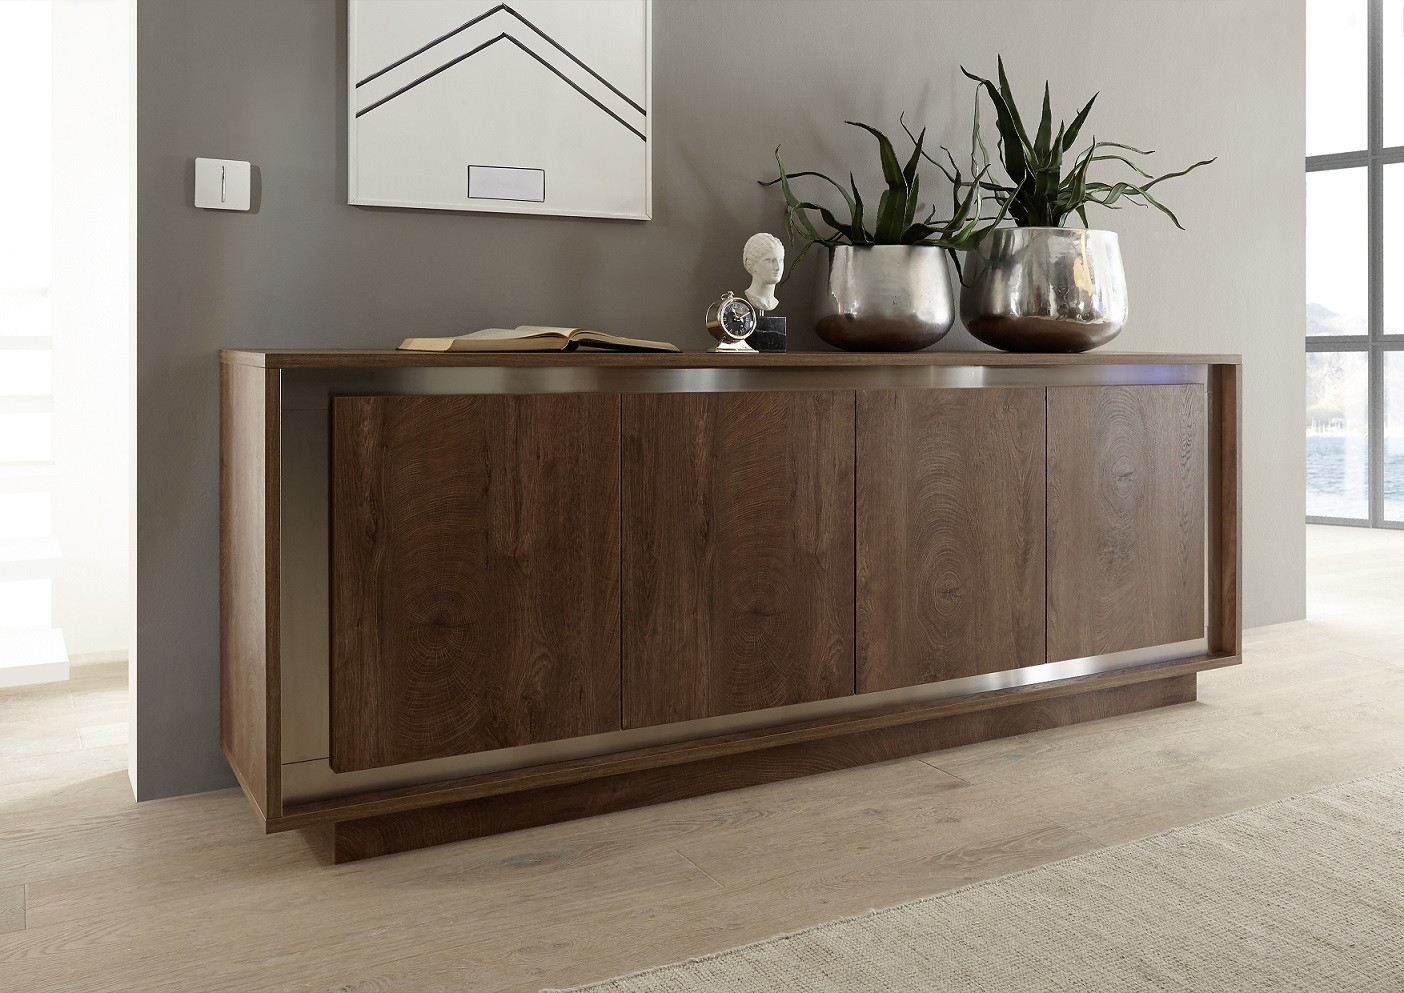 modern sideboards uk  sena home furniture - amber  oak cognac  door modern sideboard